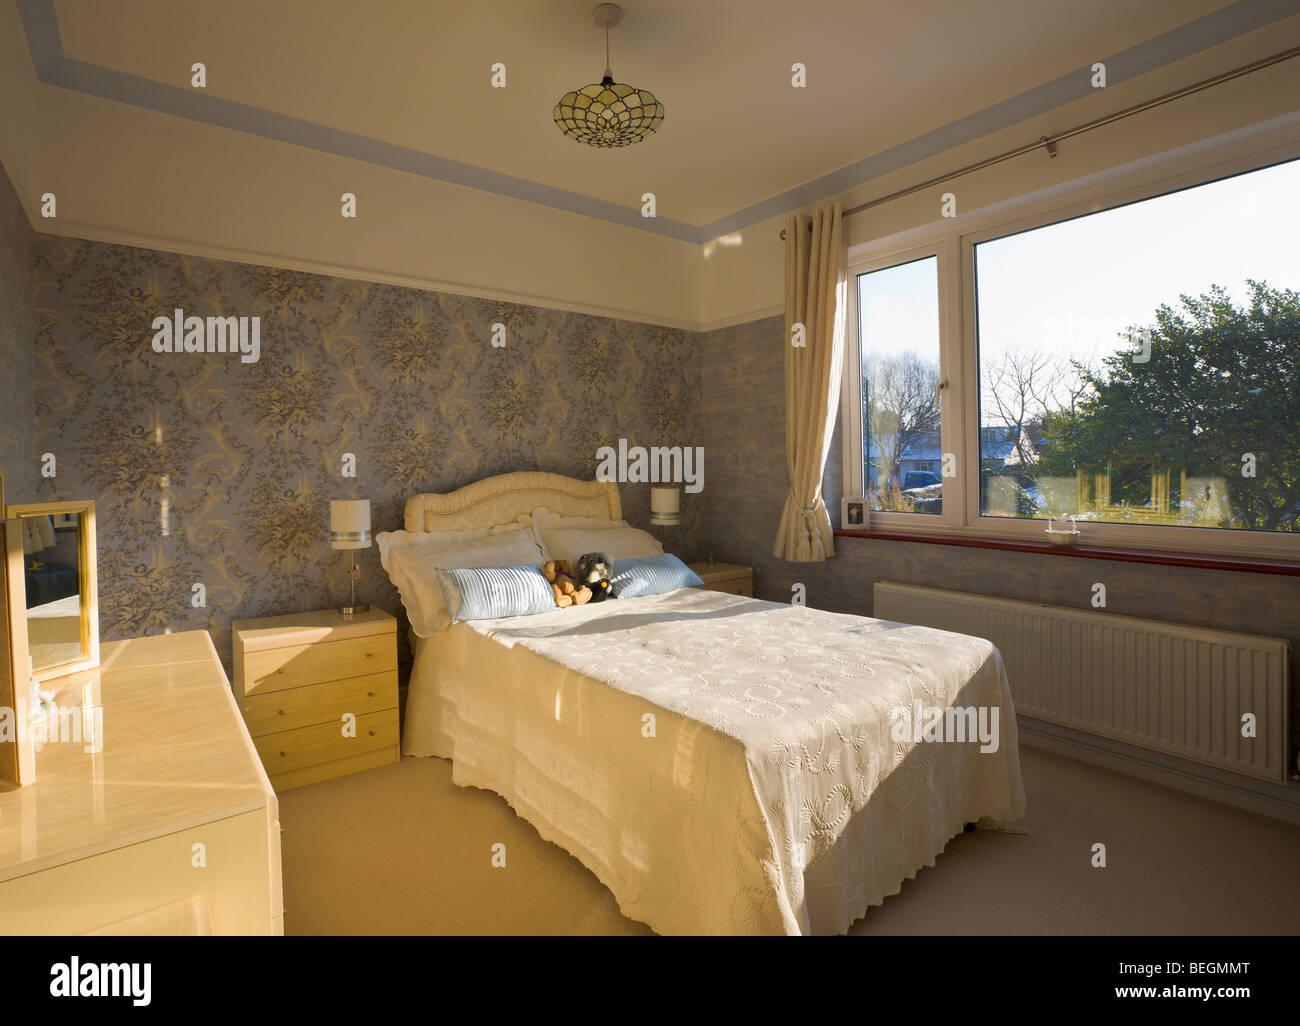 Schlafzimmer mit Doppelbett Stockbild